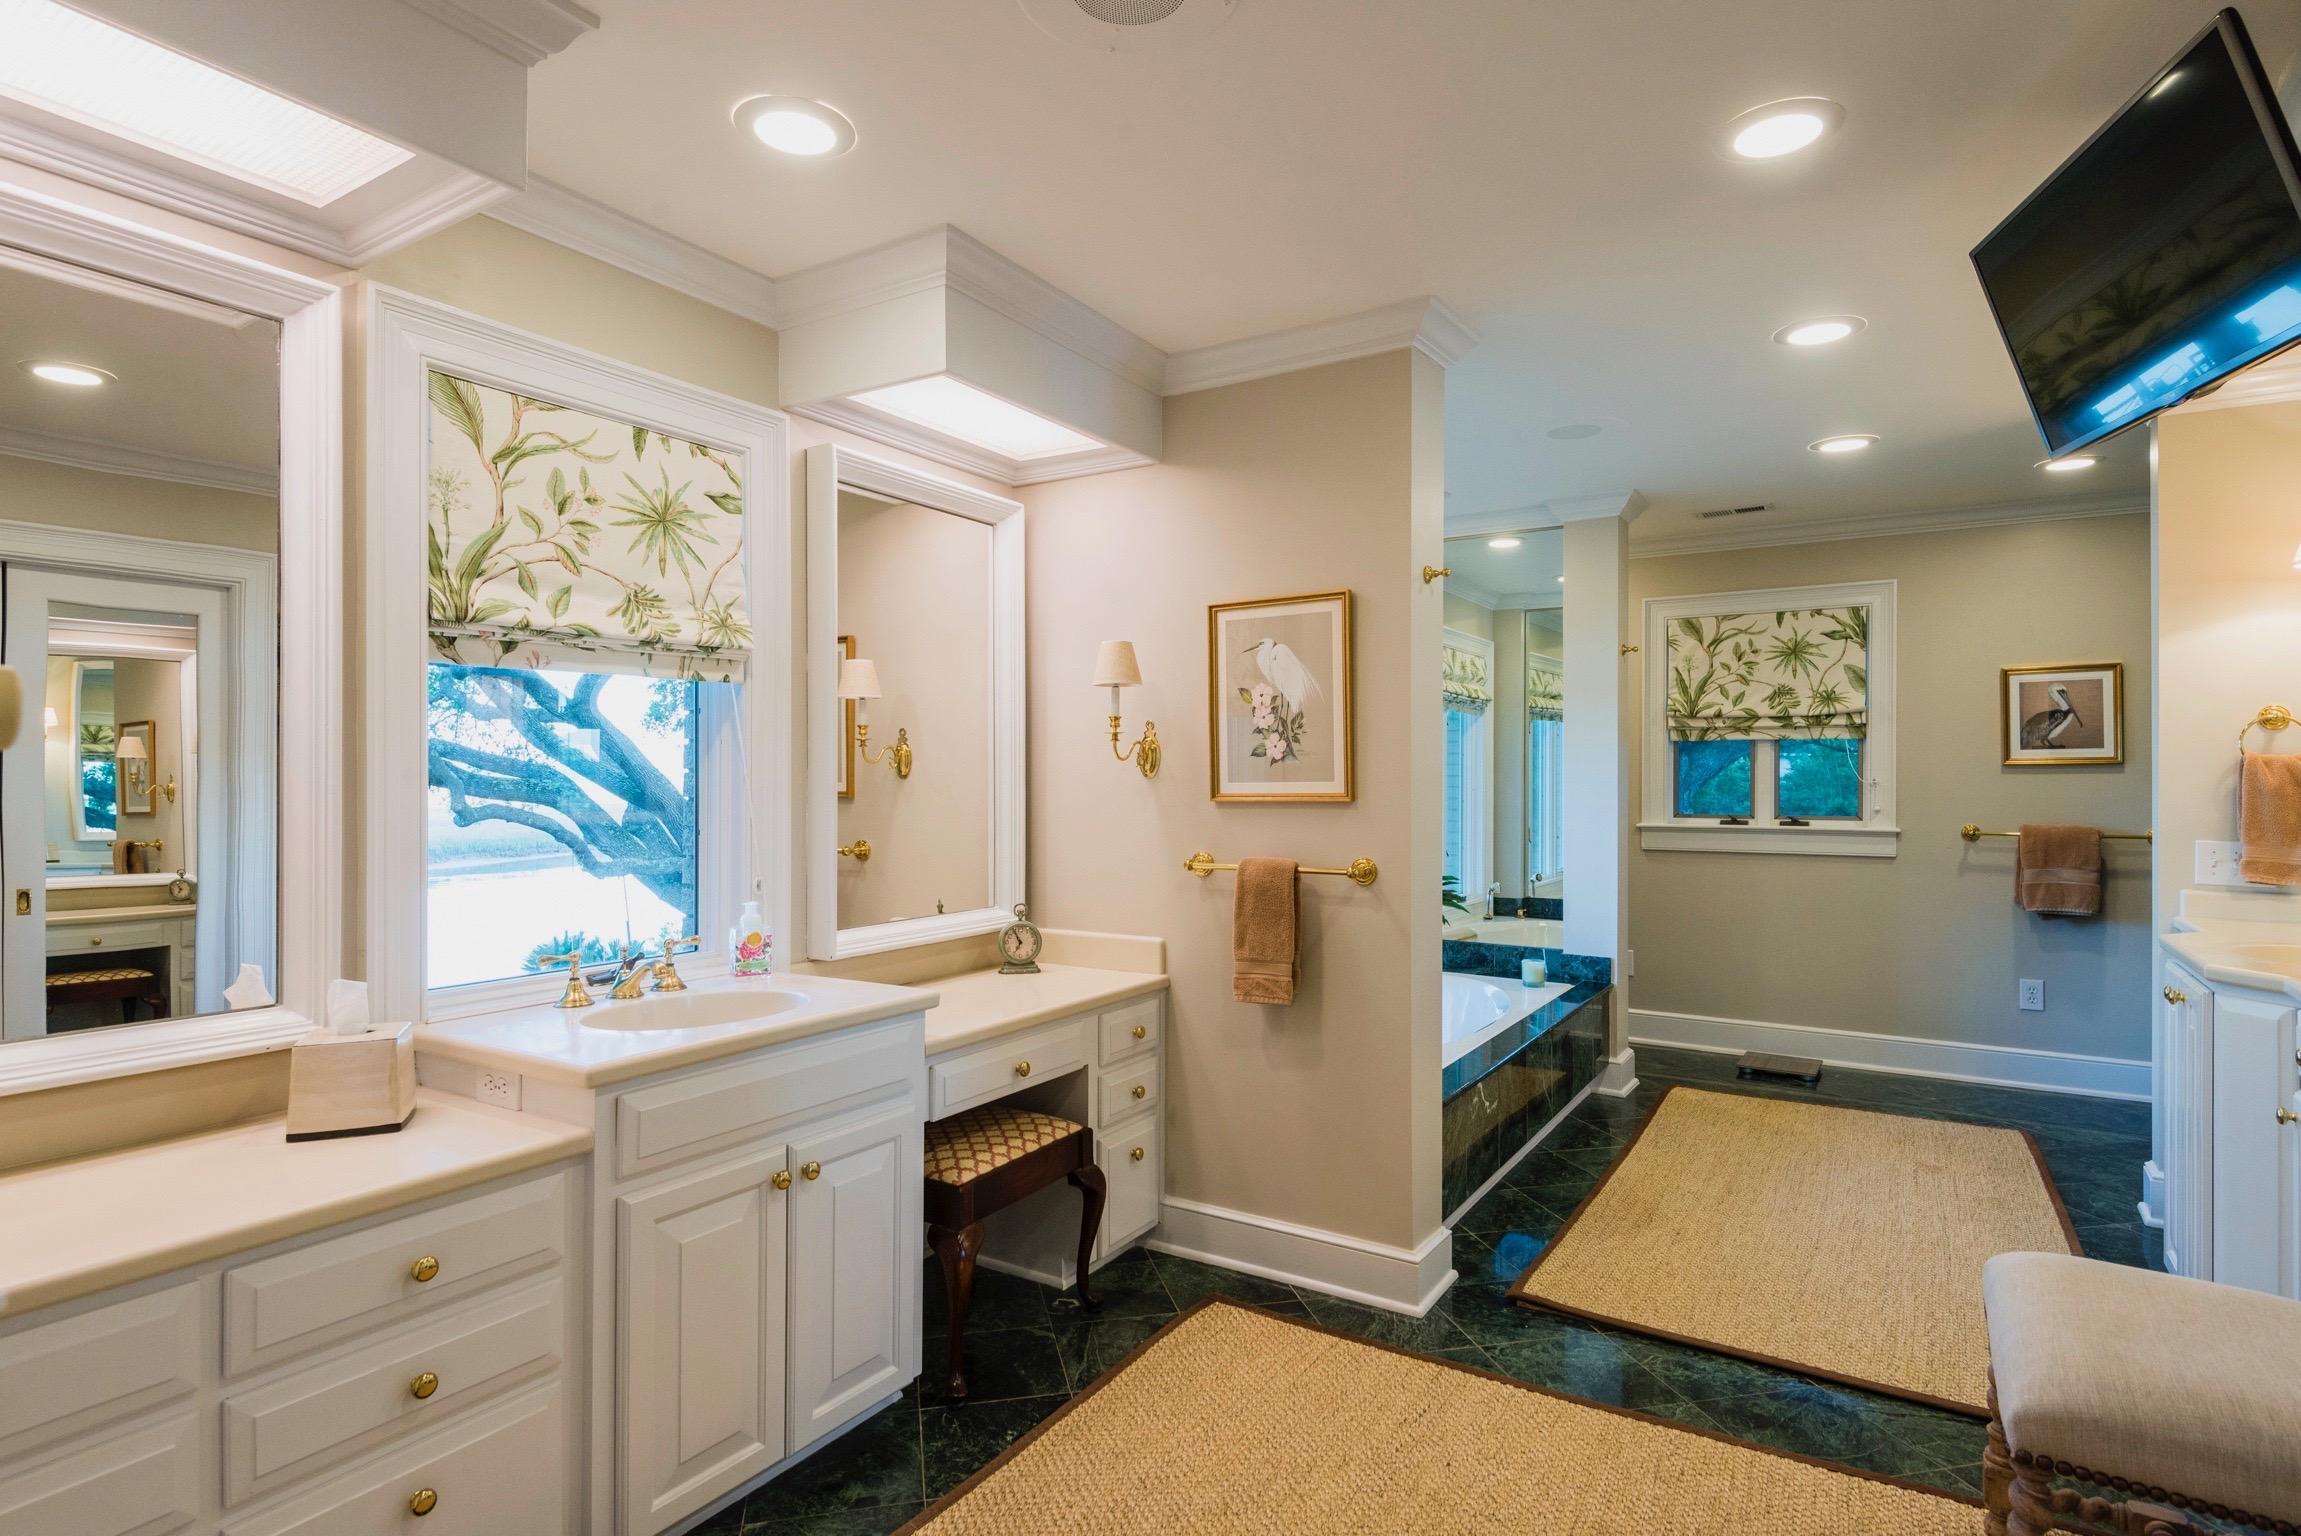 Lawton Bluff Homes For Sale - 685 Shore, Charleston, SC - 18